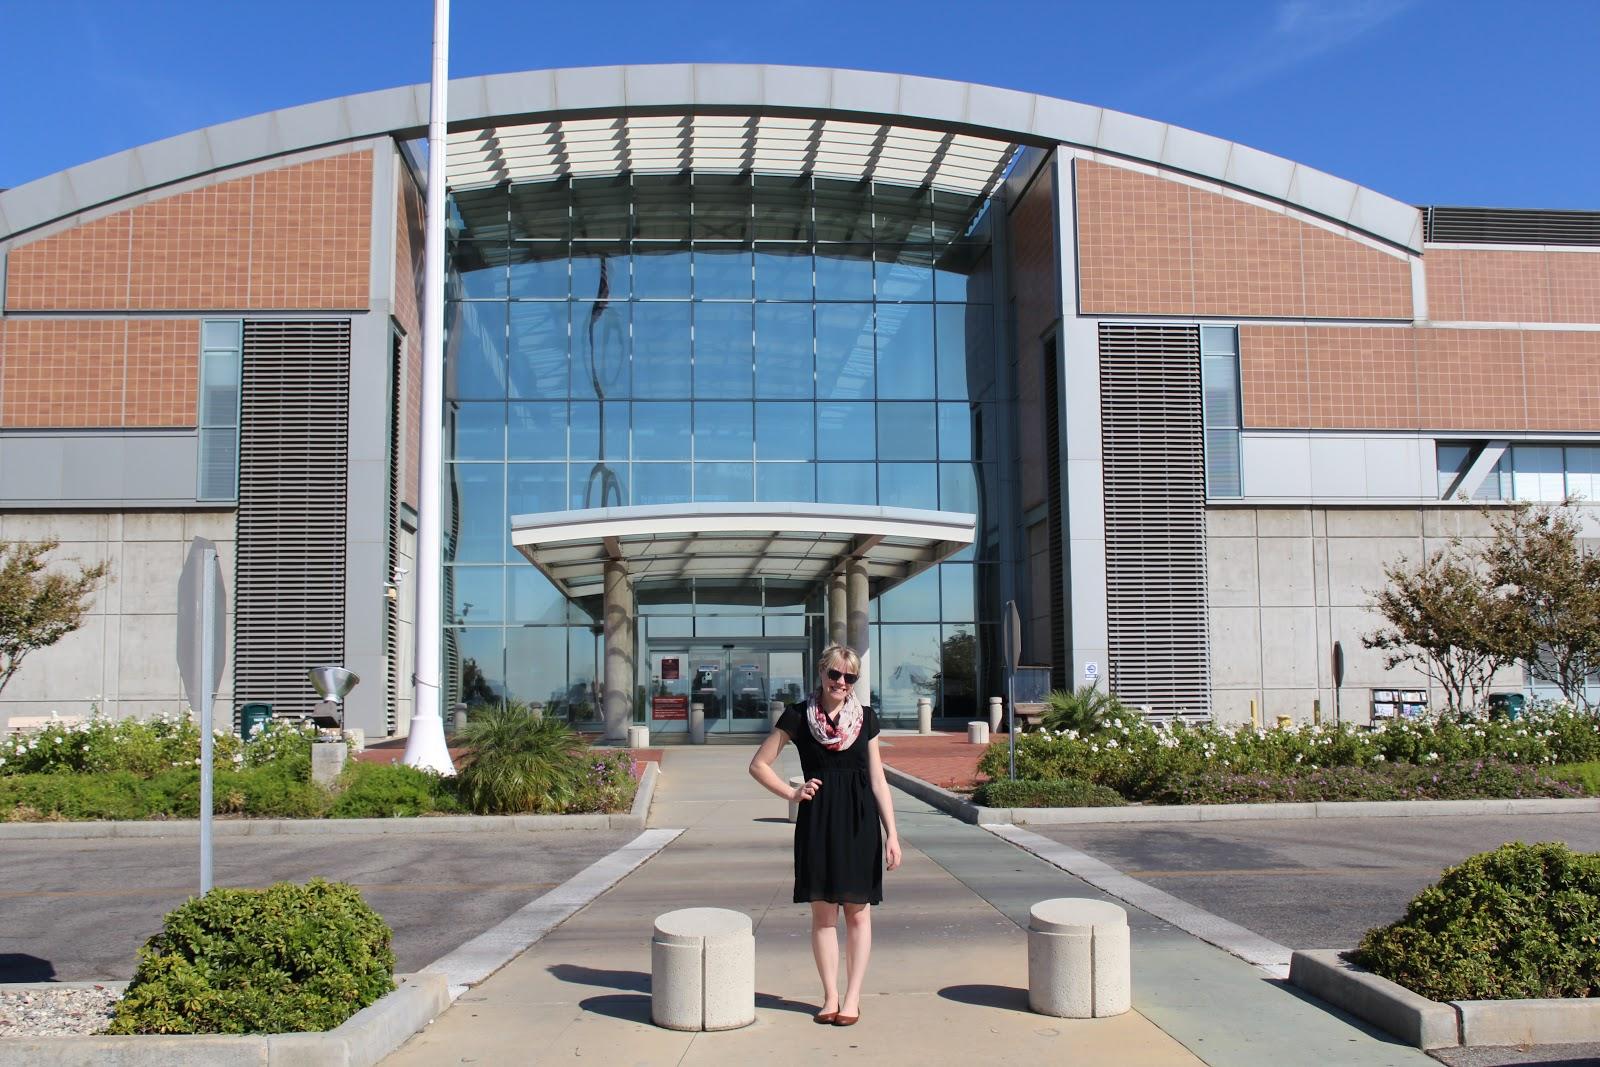 NewsOK: Oklahoma City News, Sports, Weather & Entertainment